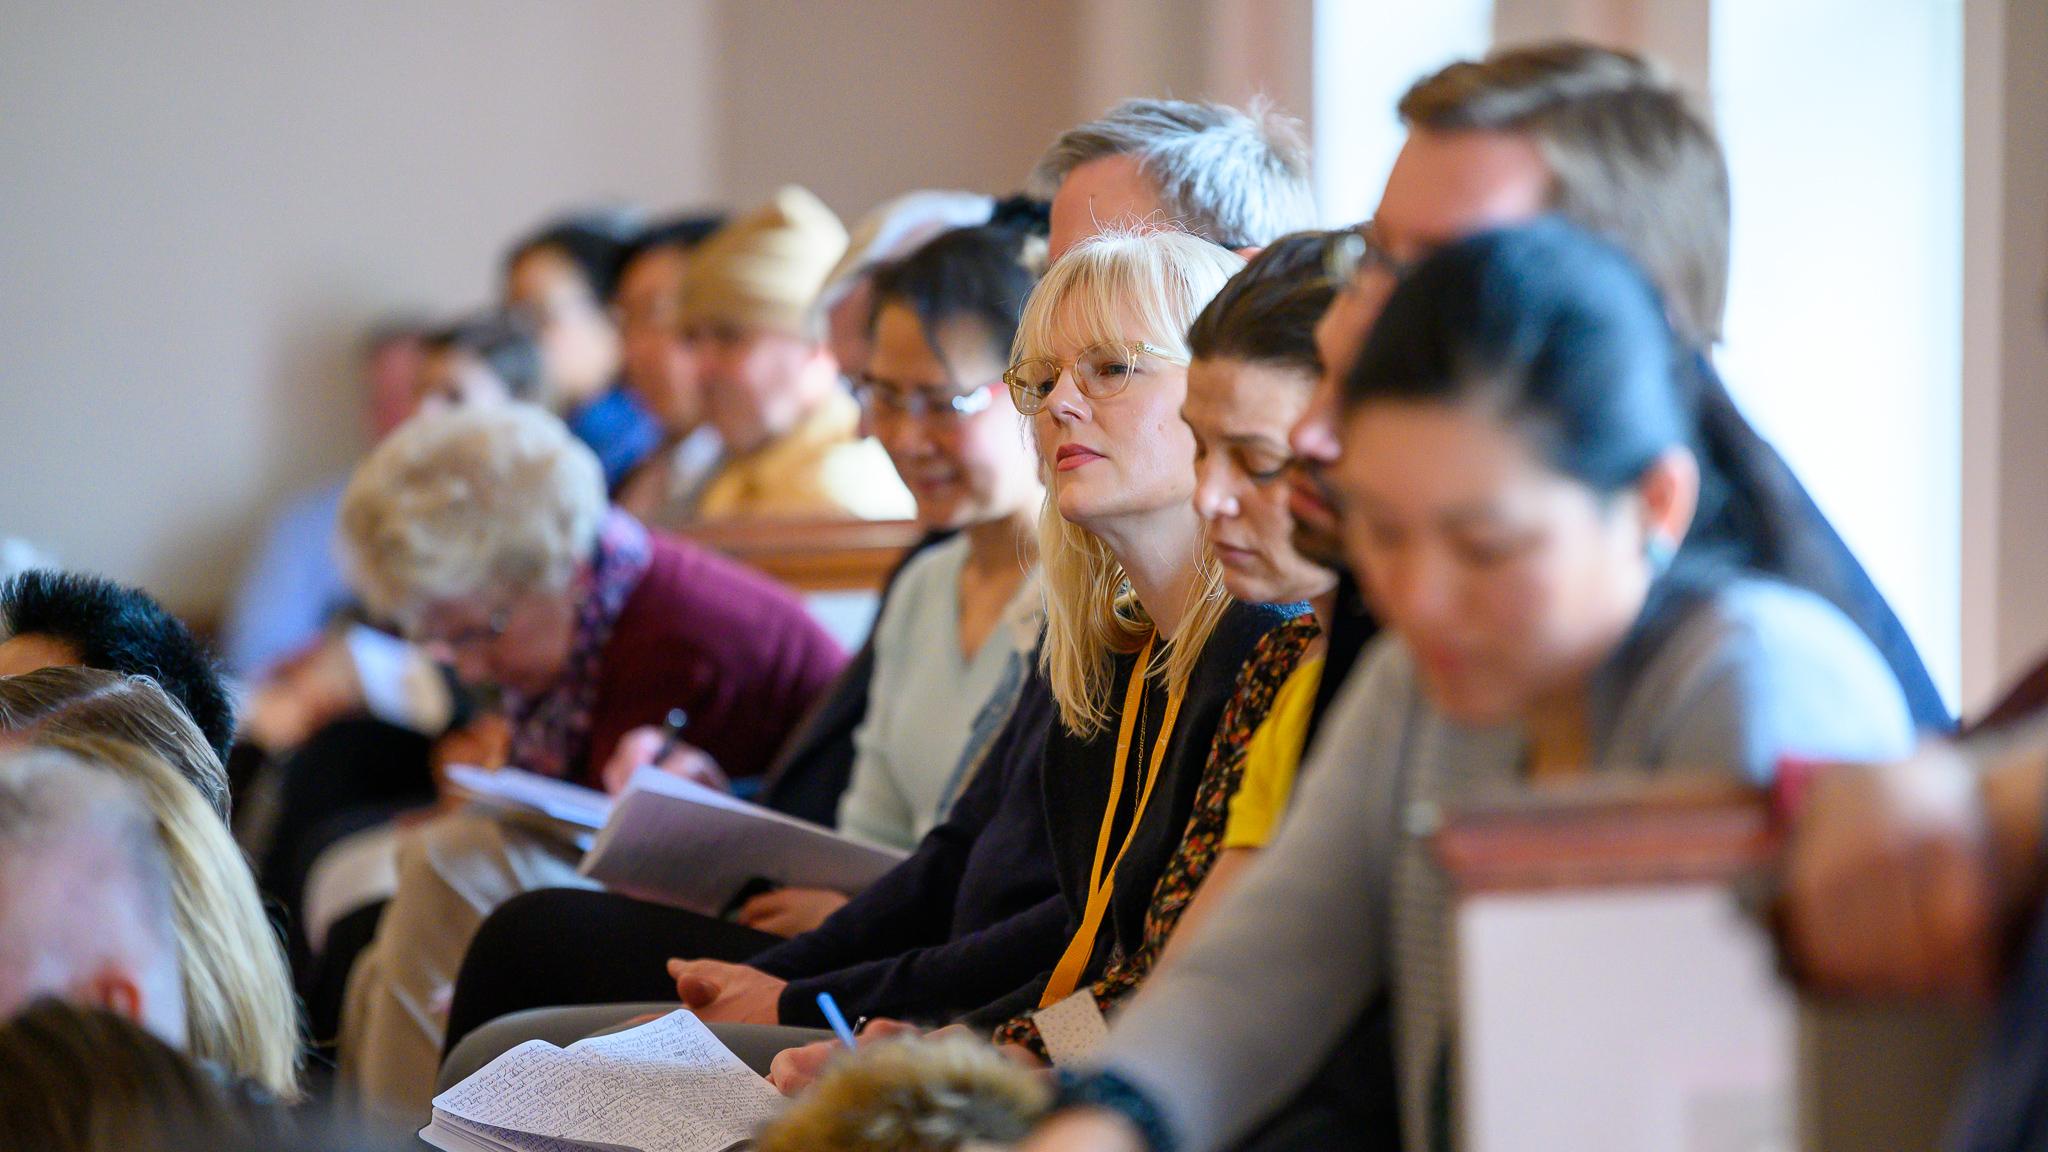 Congregants listening to a sermon